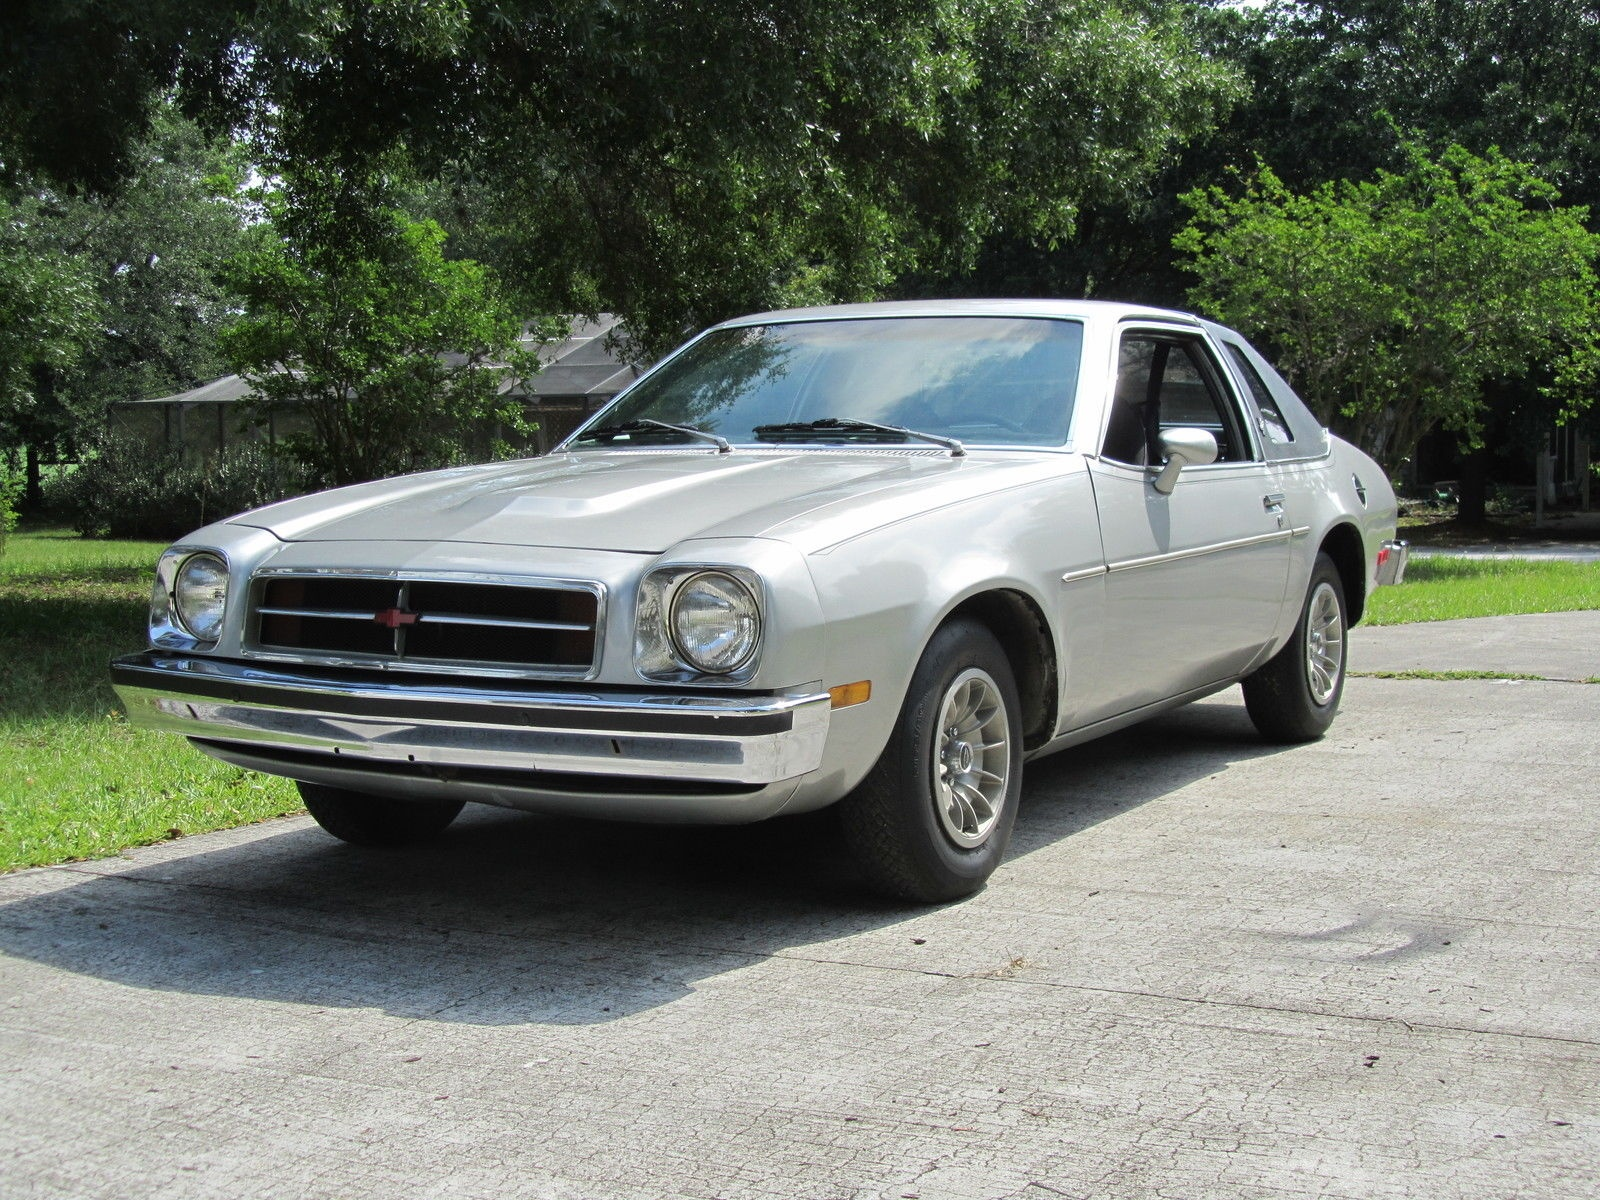 $3,500 Monza: 1980 Chevrolet Monza Towne Coupe